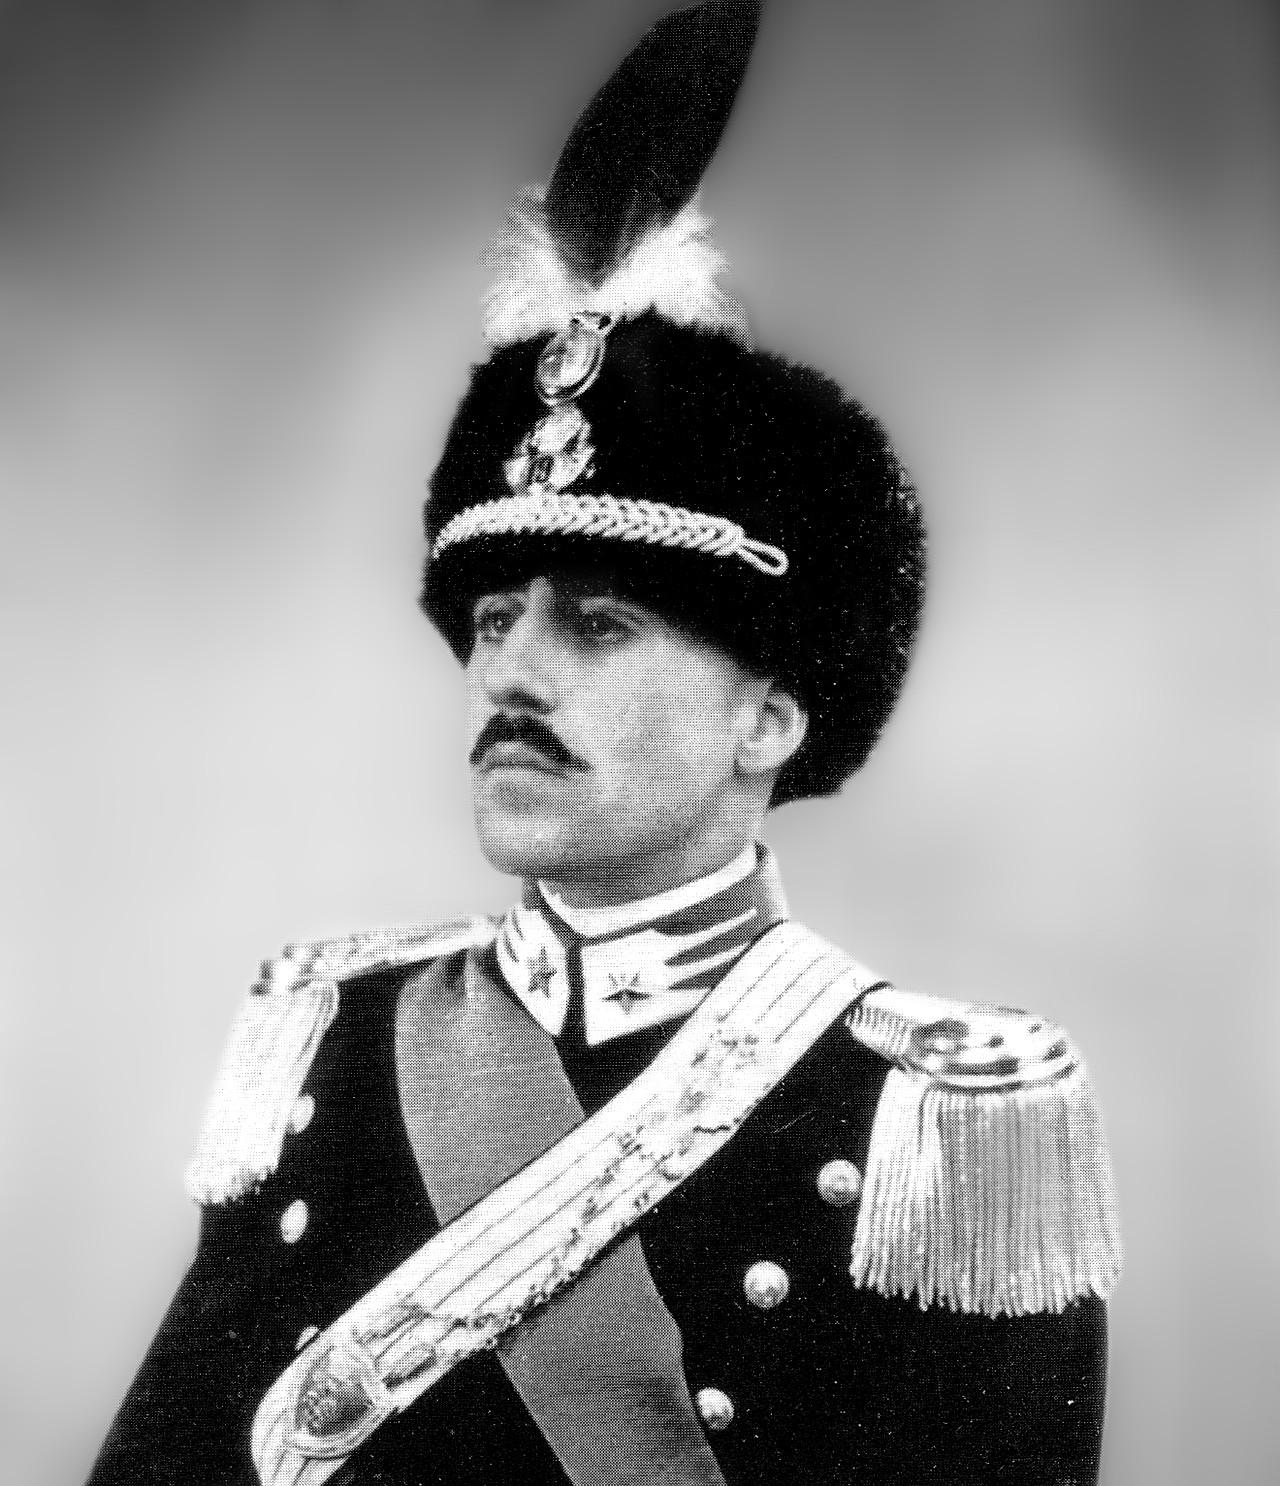 GUERRA A.O.I. MEDAGLIA CROCE ARTIGLIERIA AFRICA ORIENTALE ITALIANA 1935//1936